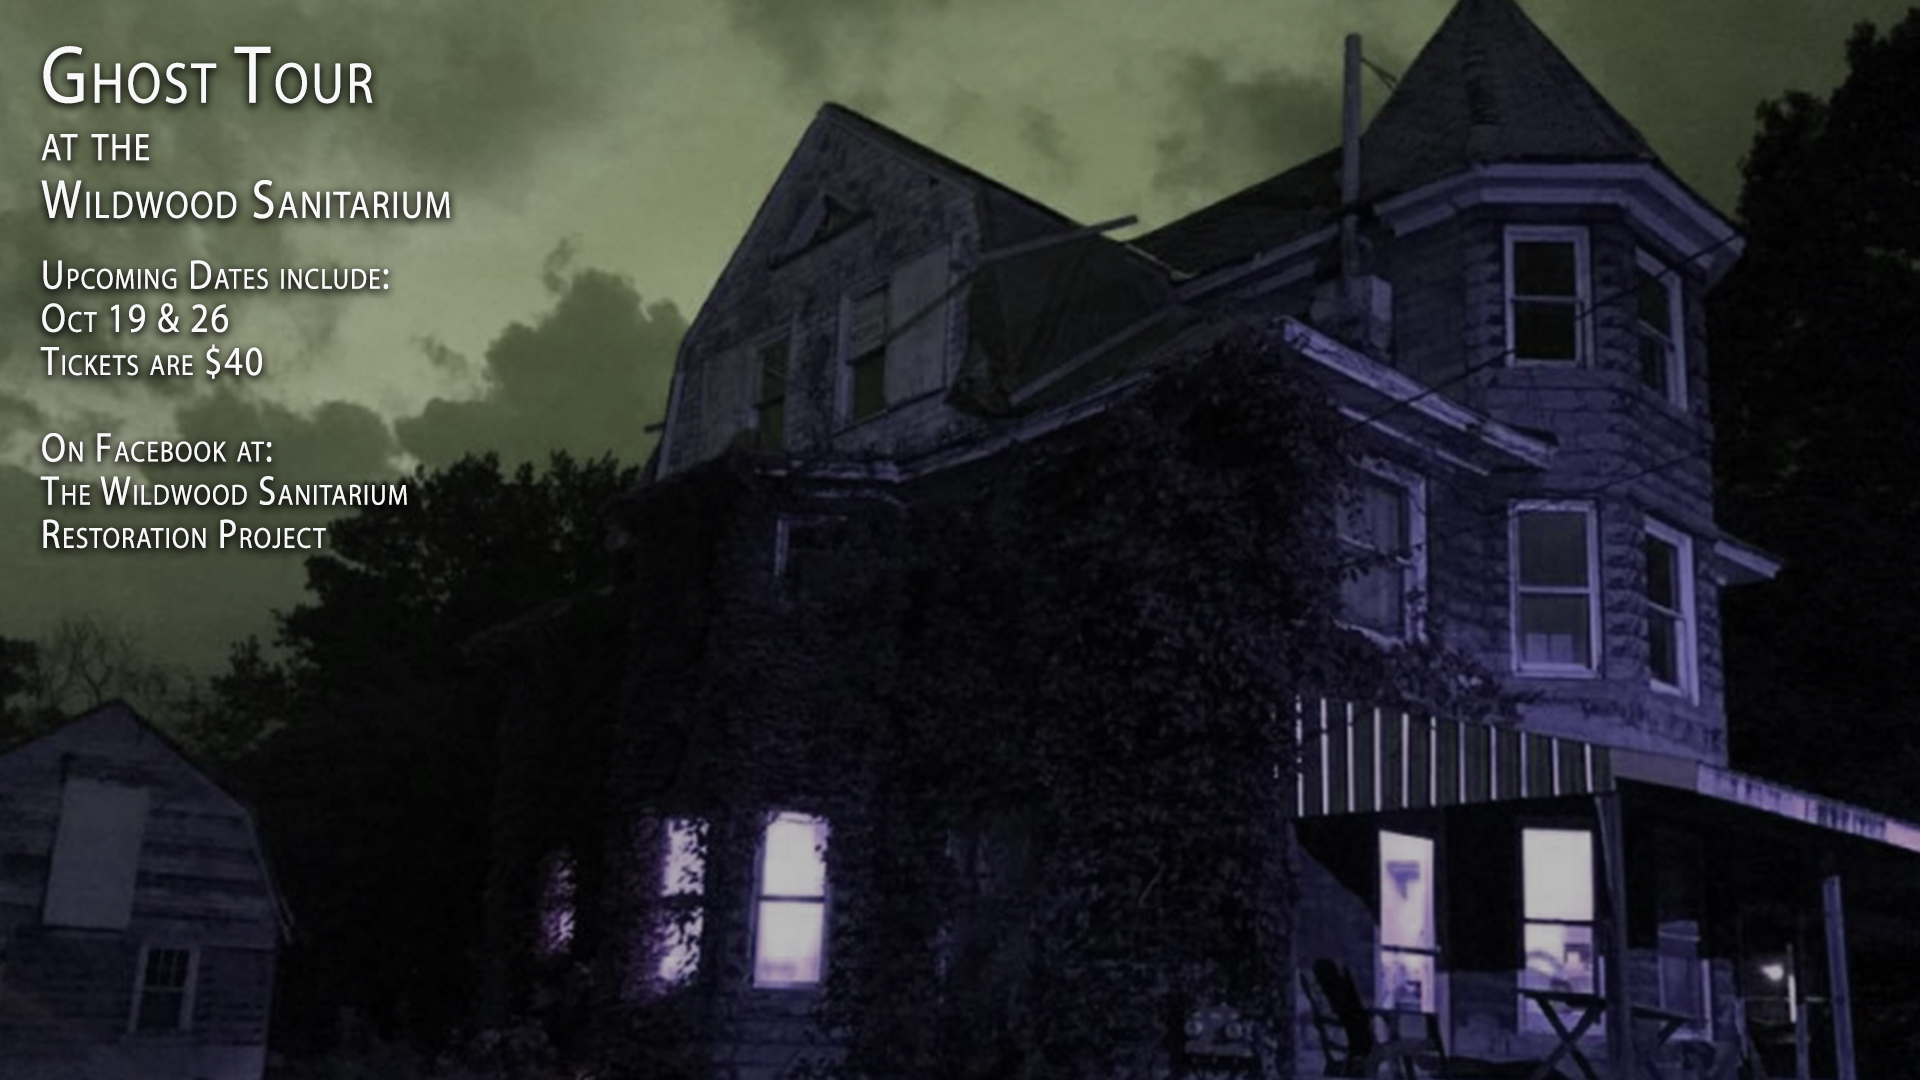 Halloween Ghost Tour Dates of the Wildwood Sanitarium